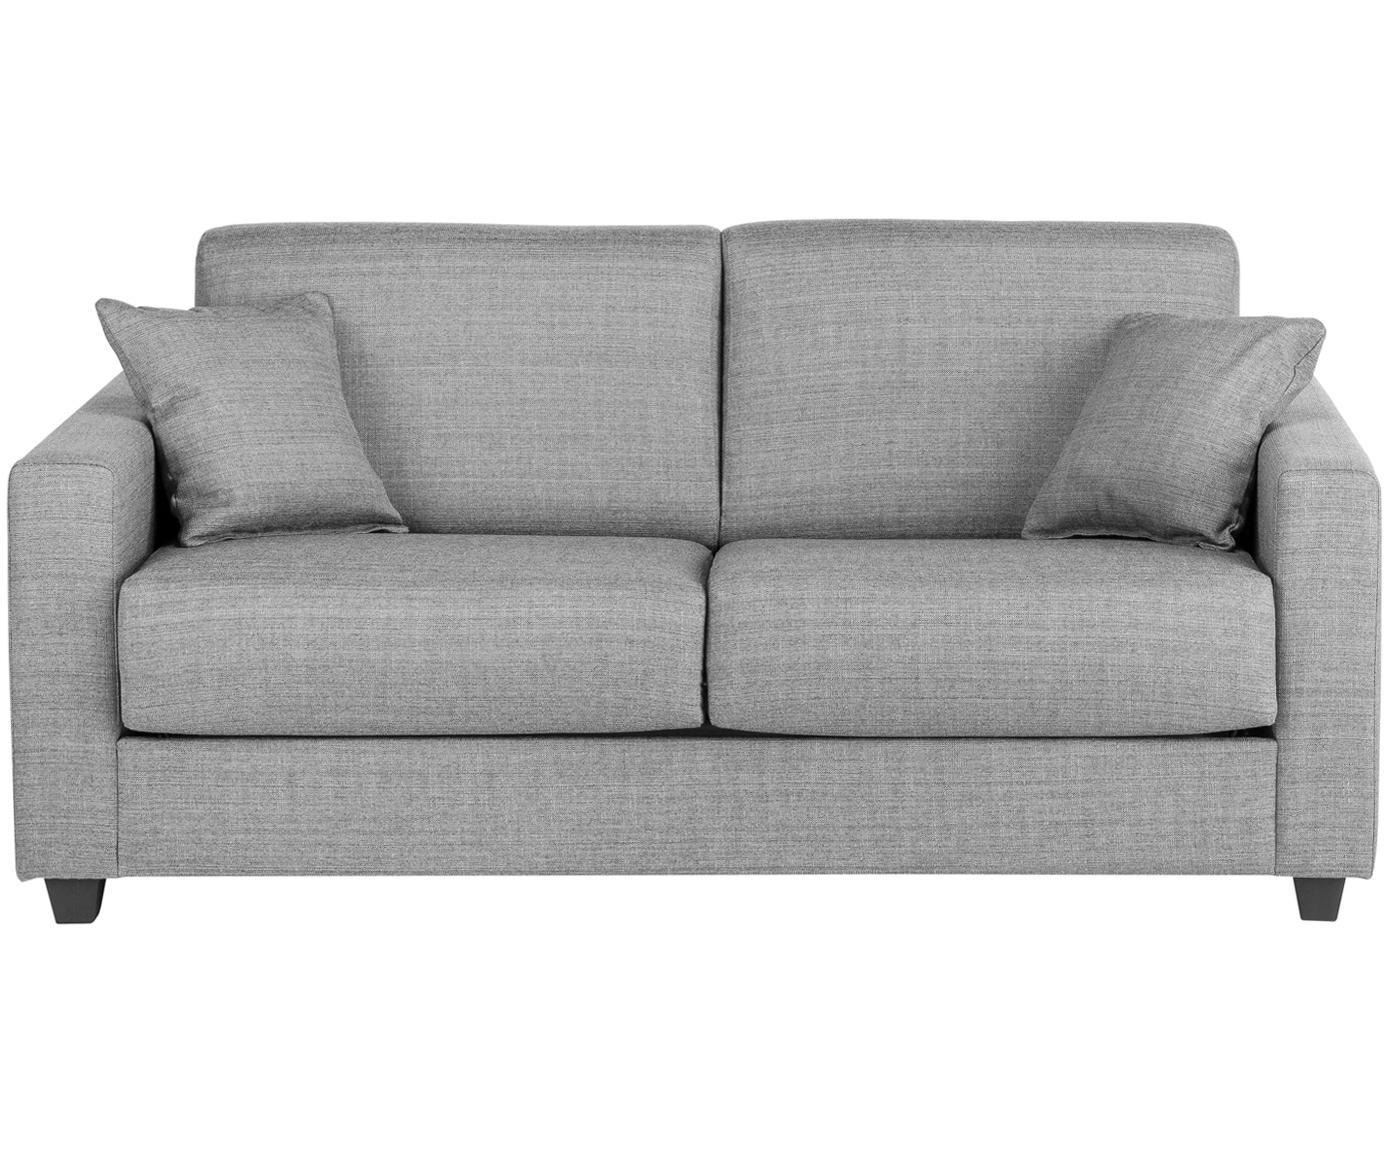 Sofá cama Maria, Tapizado: 40%algodón, 20%lino, 20, Patas: plástico, Estructura: tablero de fibras de dens, Gris claro, An 180 x F 102 cm